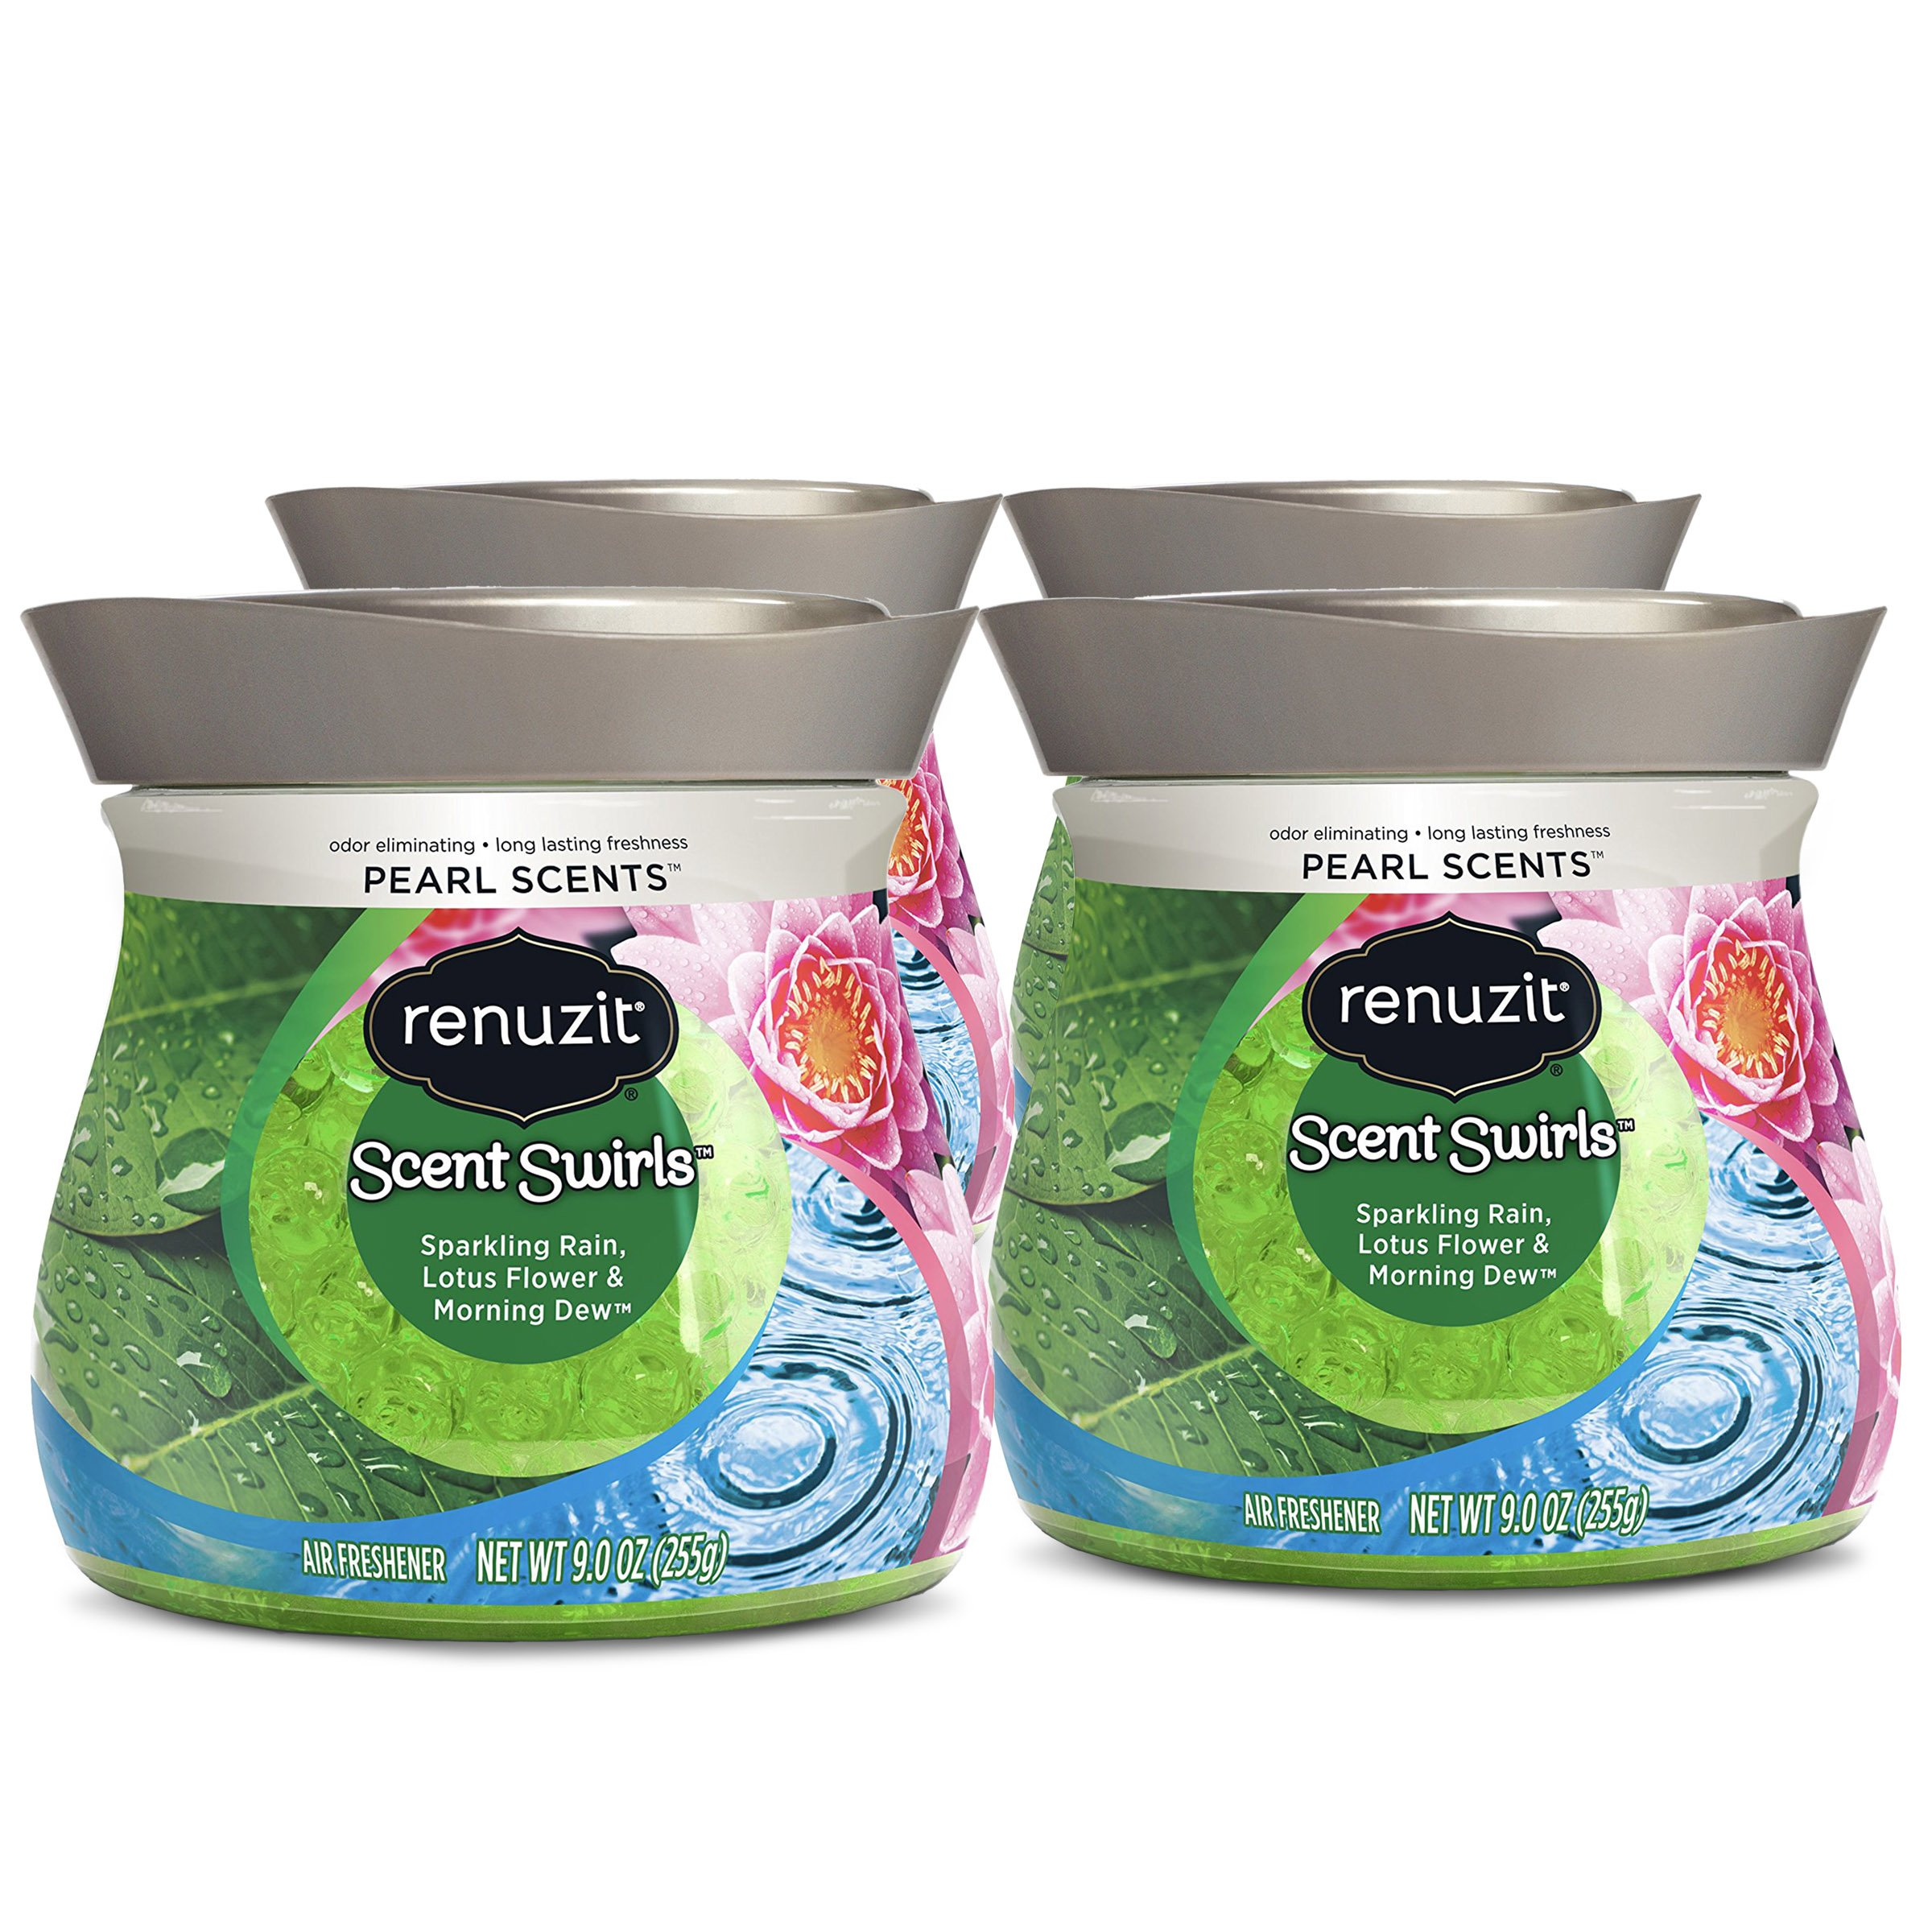 Renuzit Pearl Scents Air Freshener, Sparkling Rain, Lotus Flower & Morning Dew, 9 Ounces (4 Count) by Renuzit